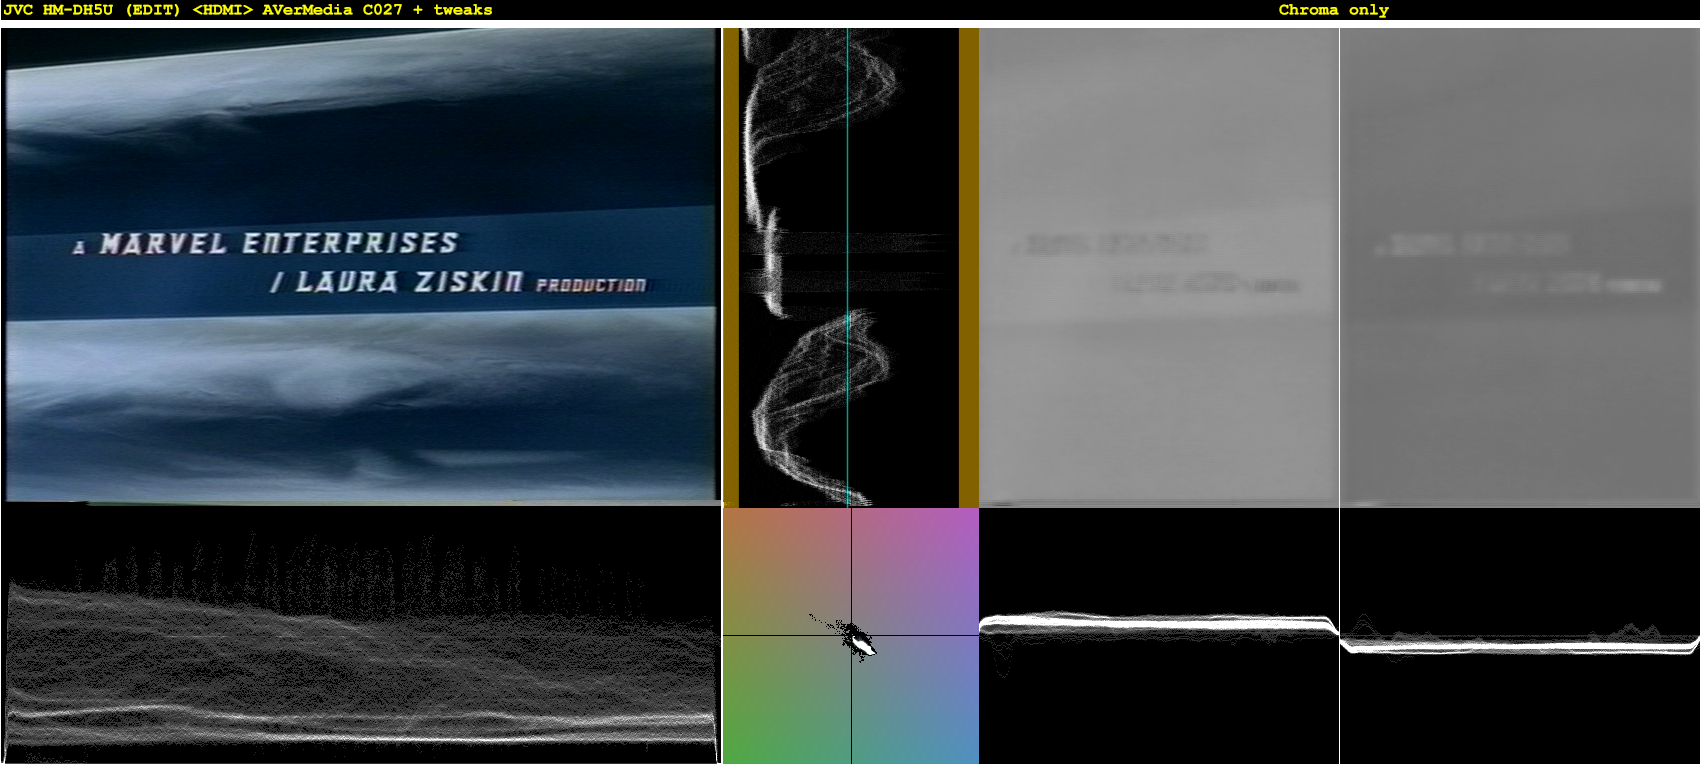 Click image for larger version  Name:0-09-01 - JVC HM-DH5U (EDIT).png Views:1249 Size:818.6 KB ID:37666